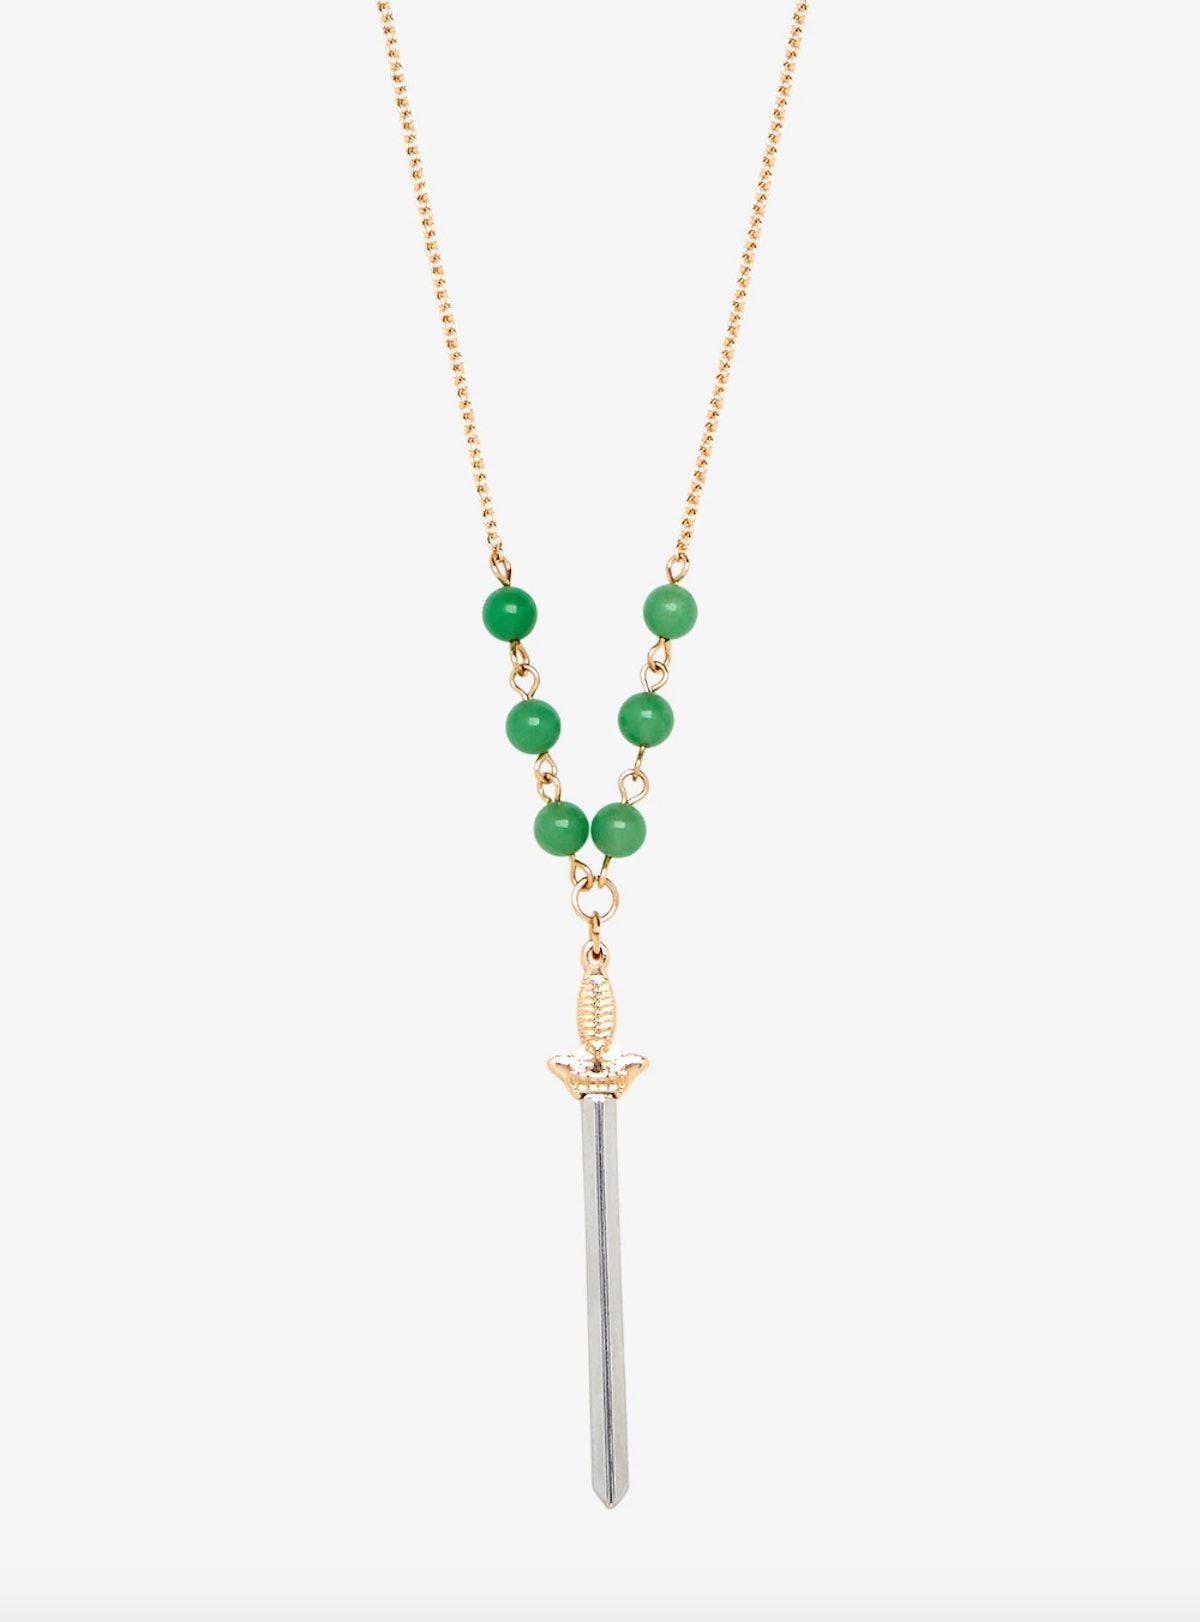 Mulan Sword Necklace